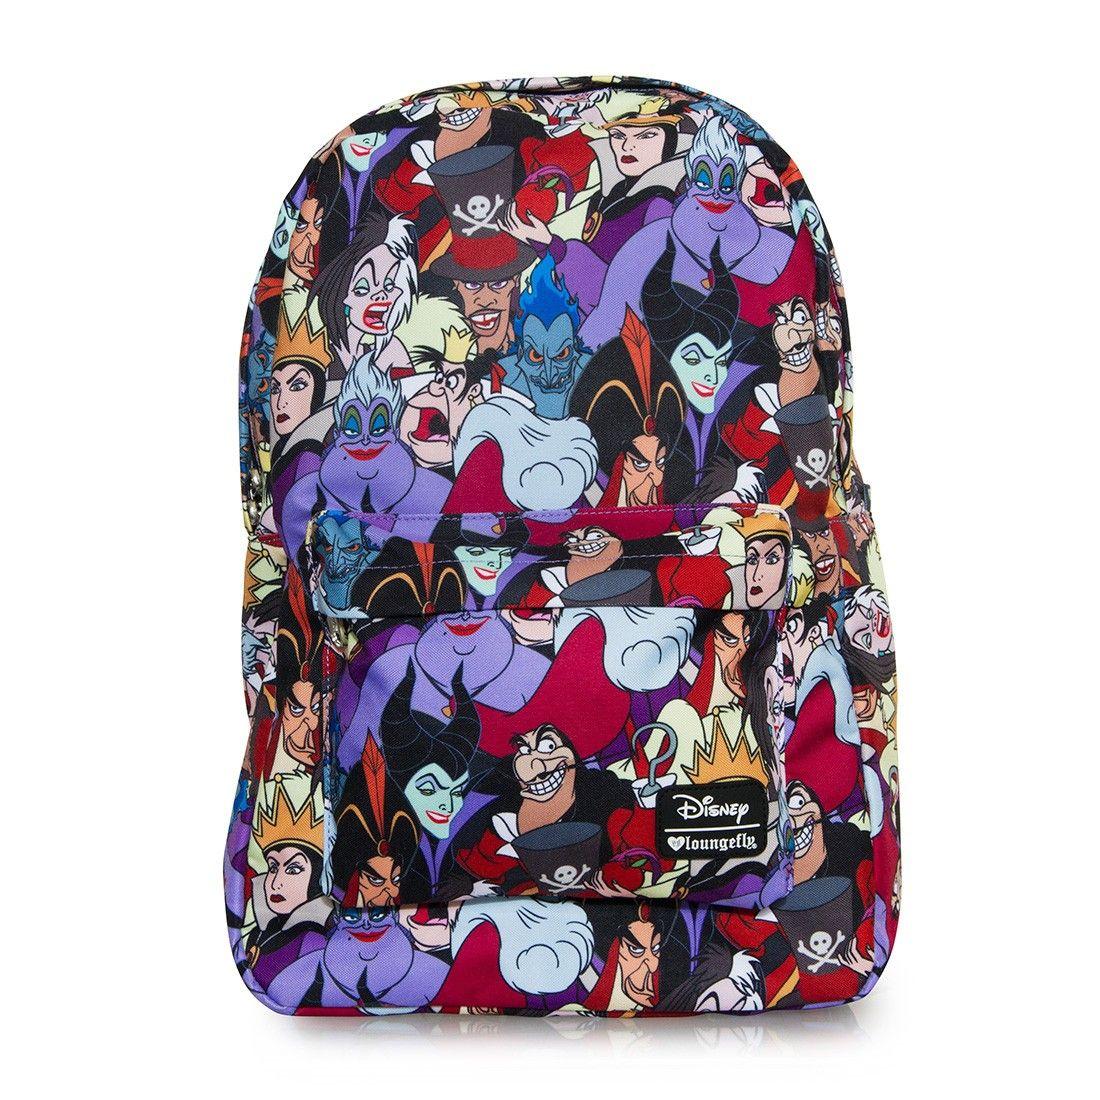 Loungefly x Disney Villains Character Print Backpack - Disney - Brands c93b23dea9ae6